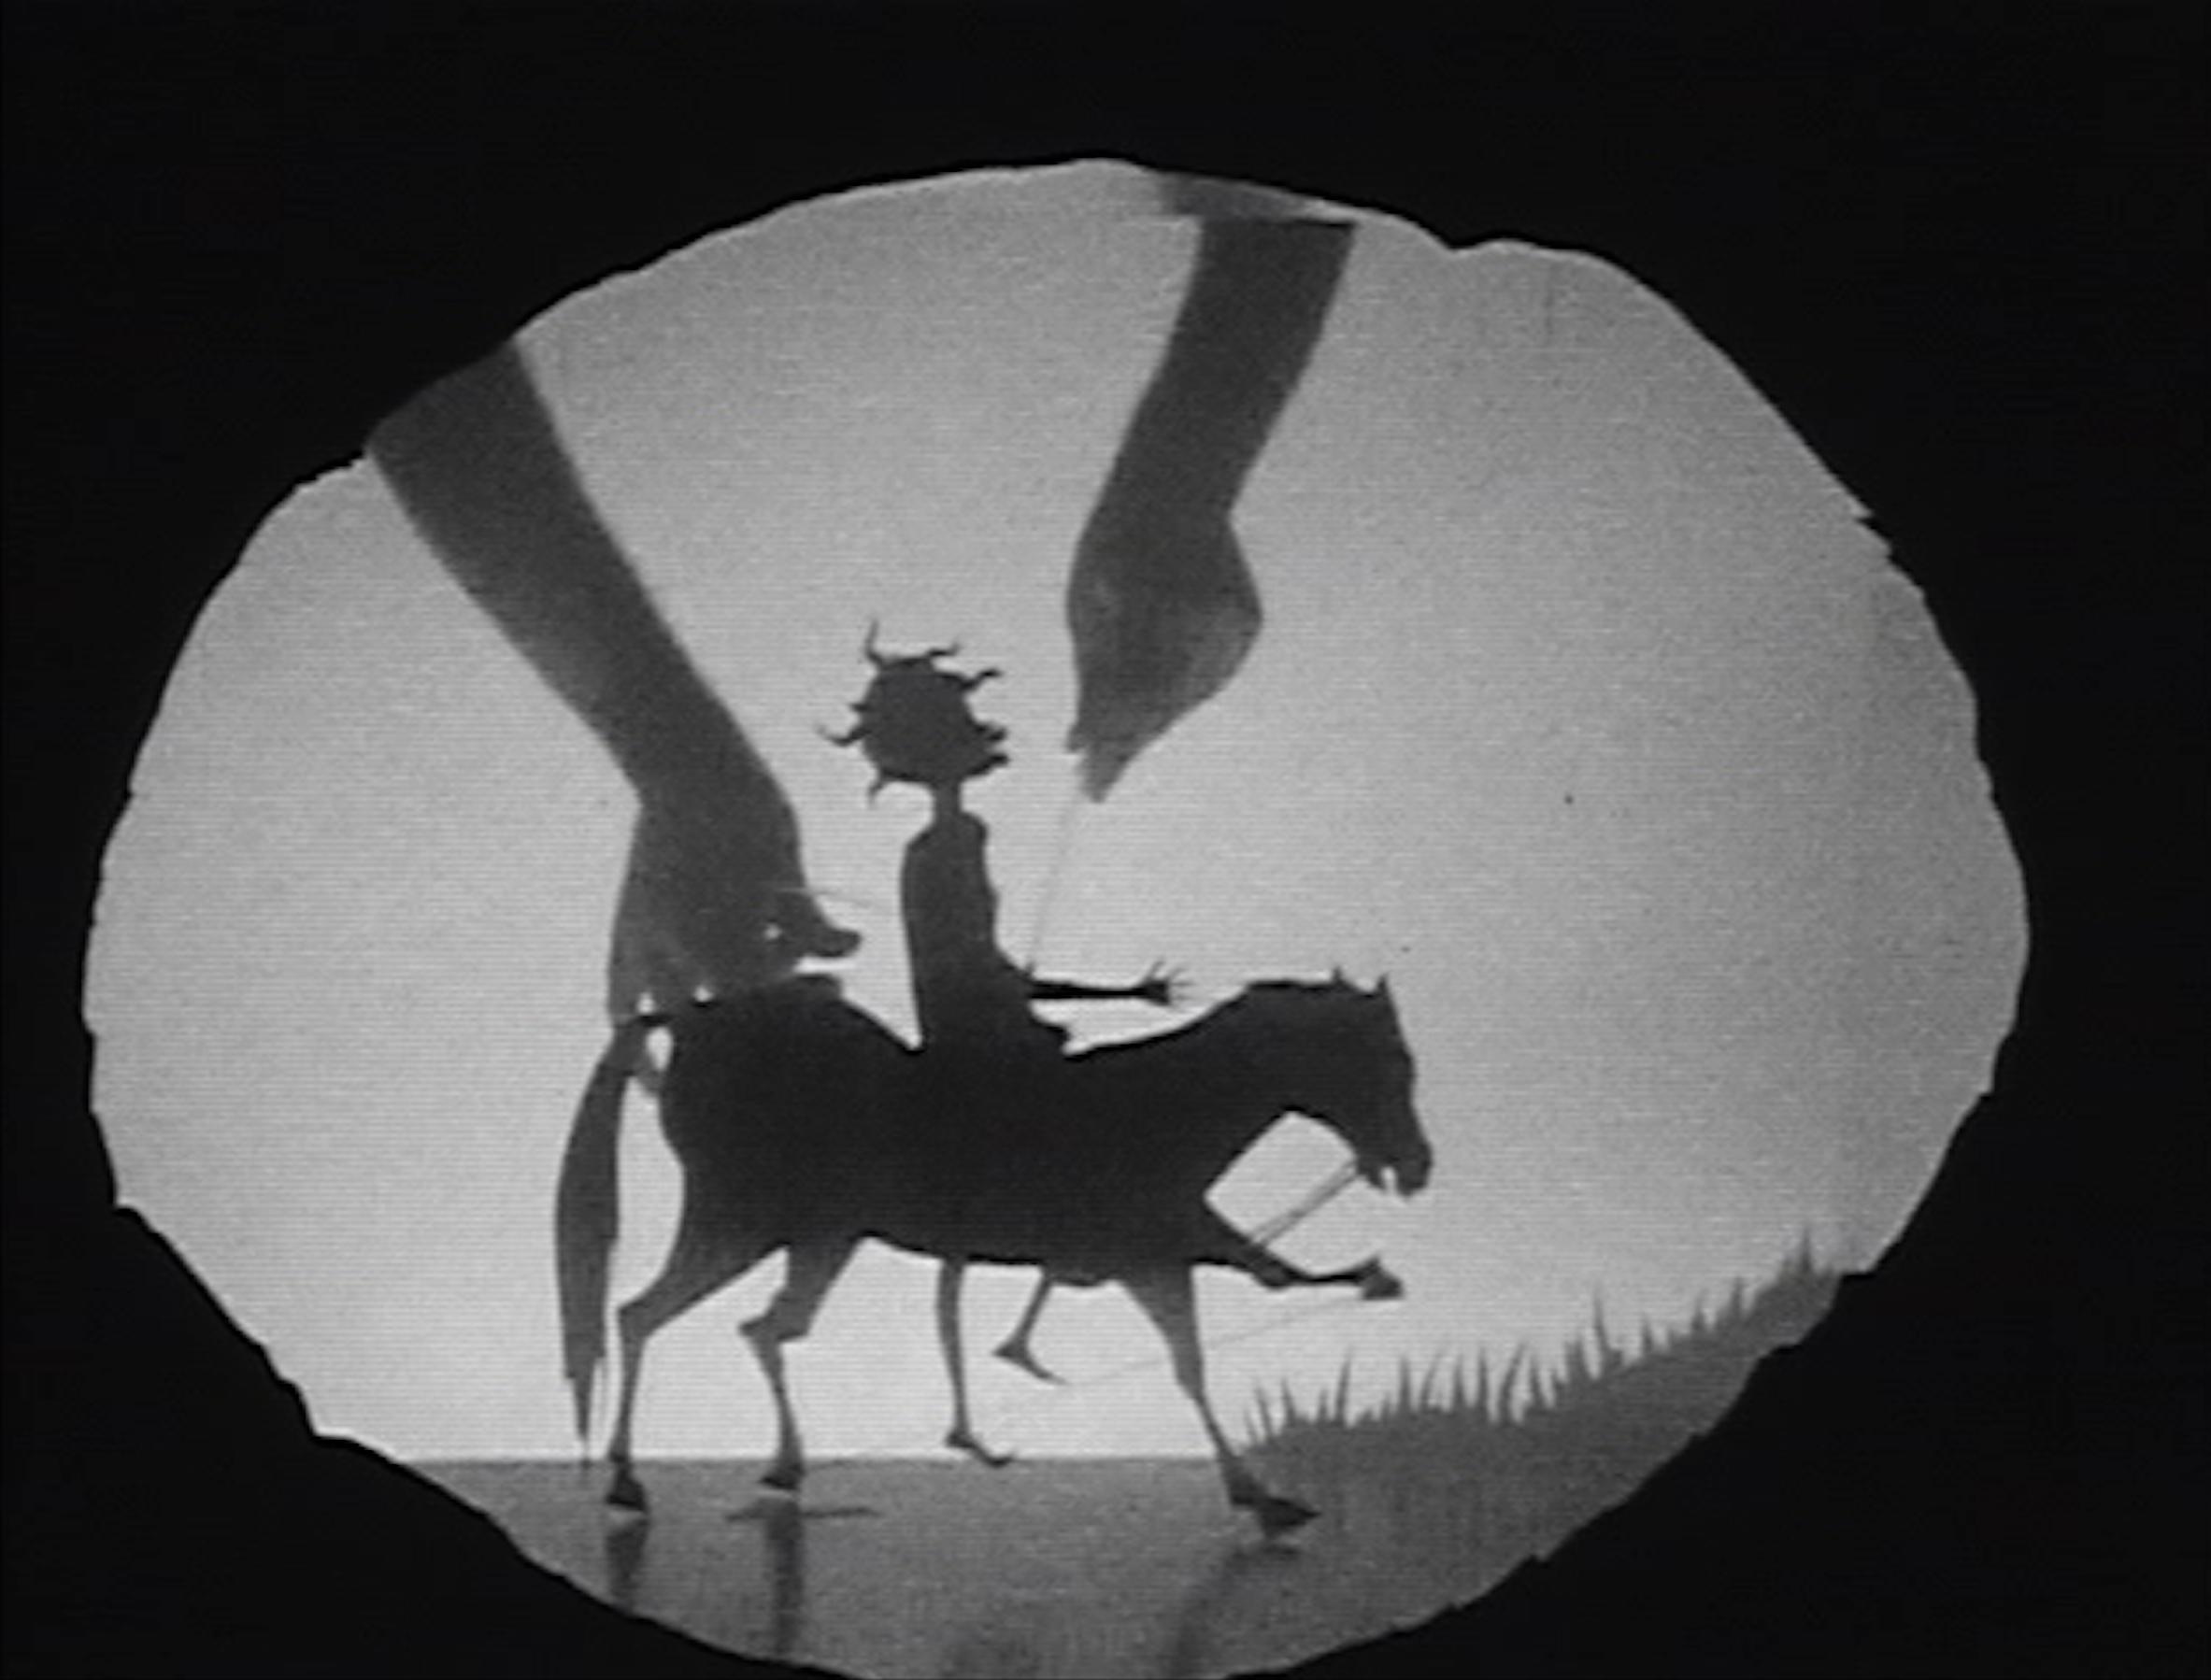 5.5 Life in Those Shadows! Kara Walker's Post-Cinematic Silhouettes ...